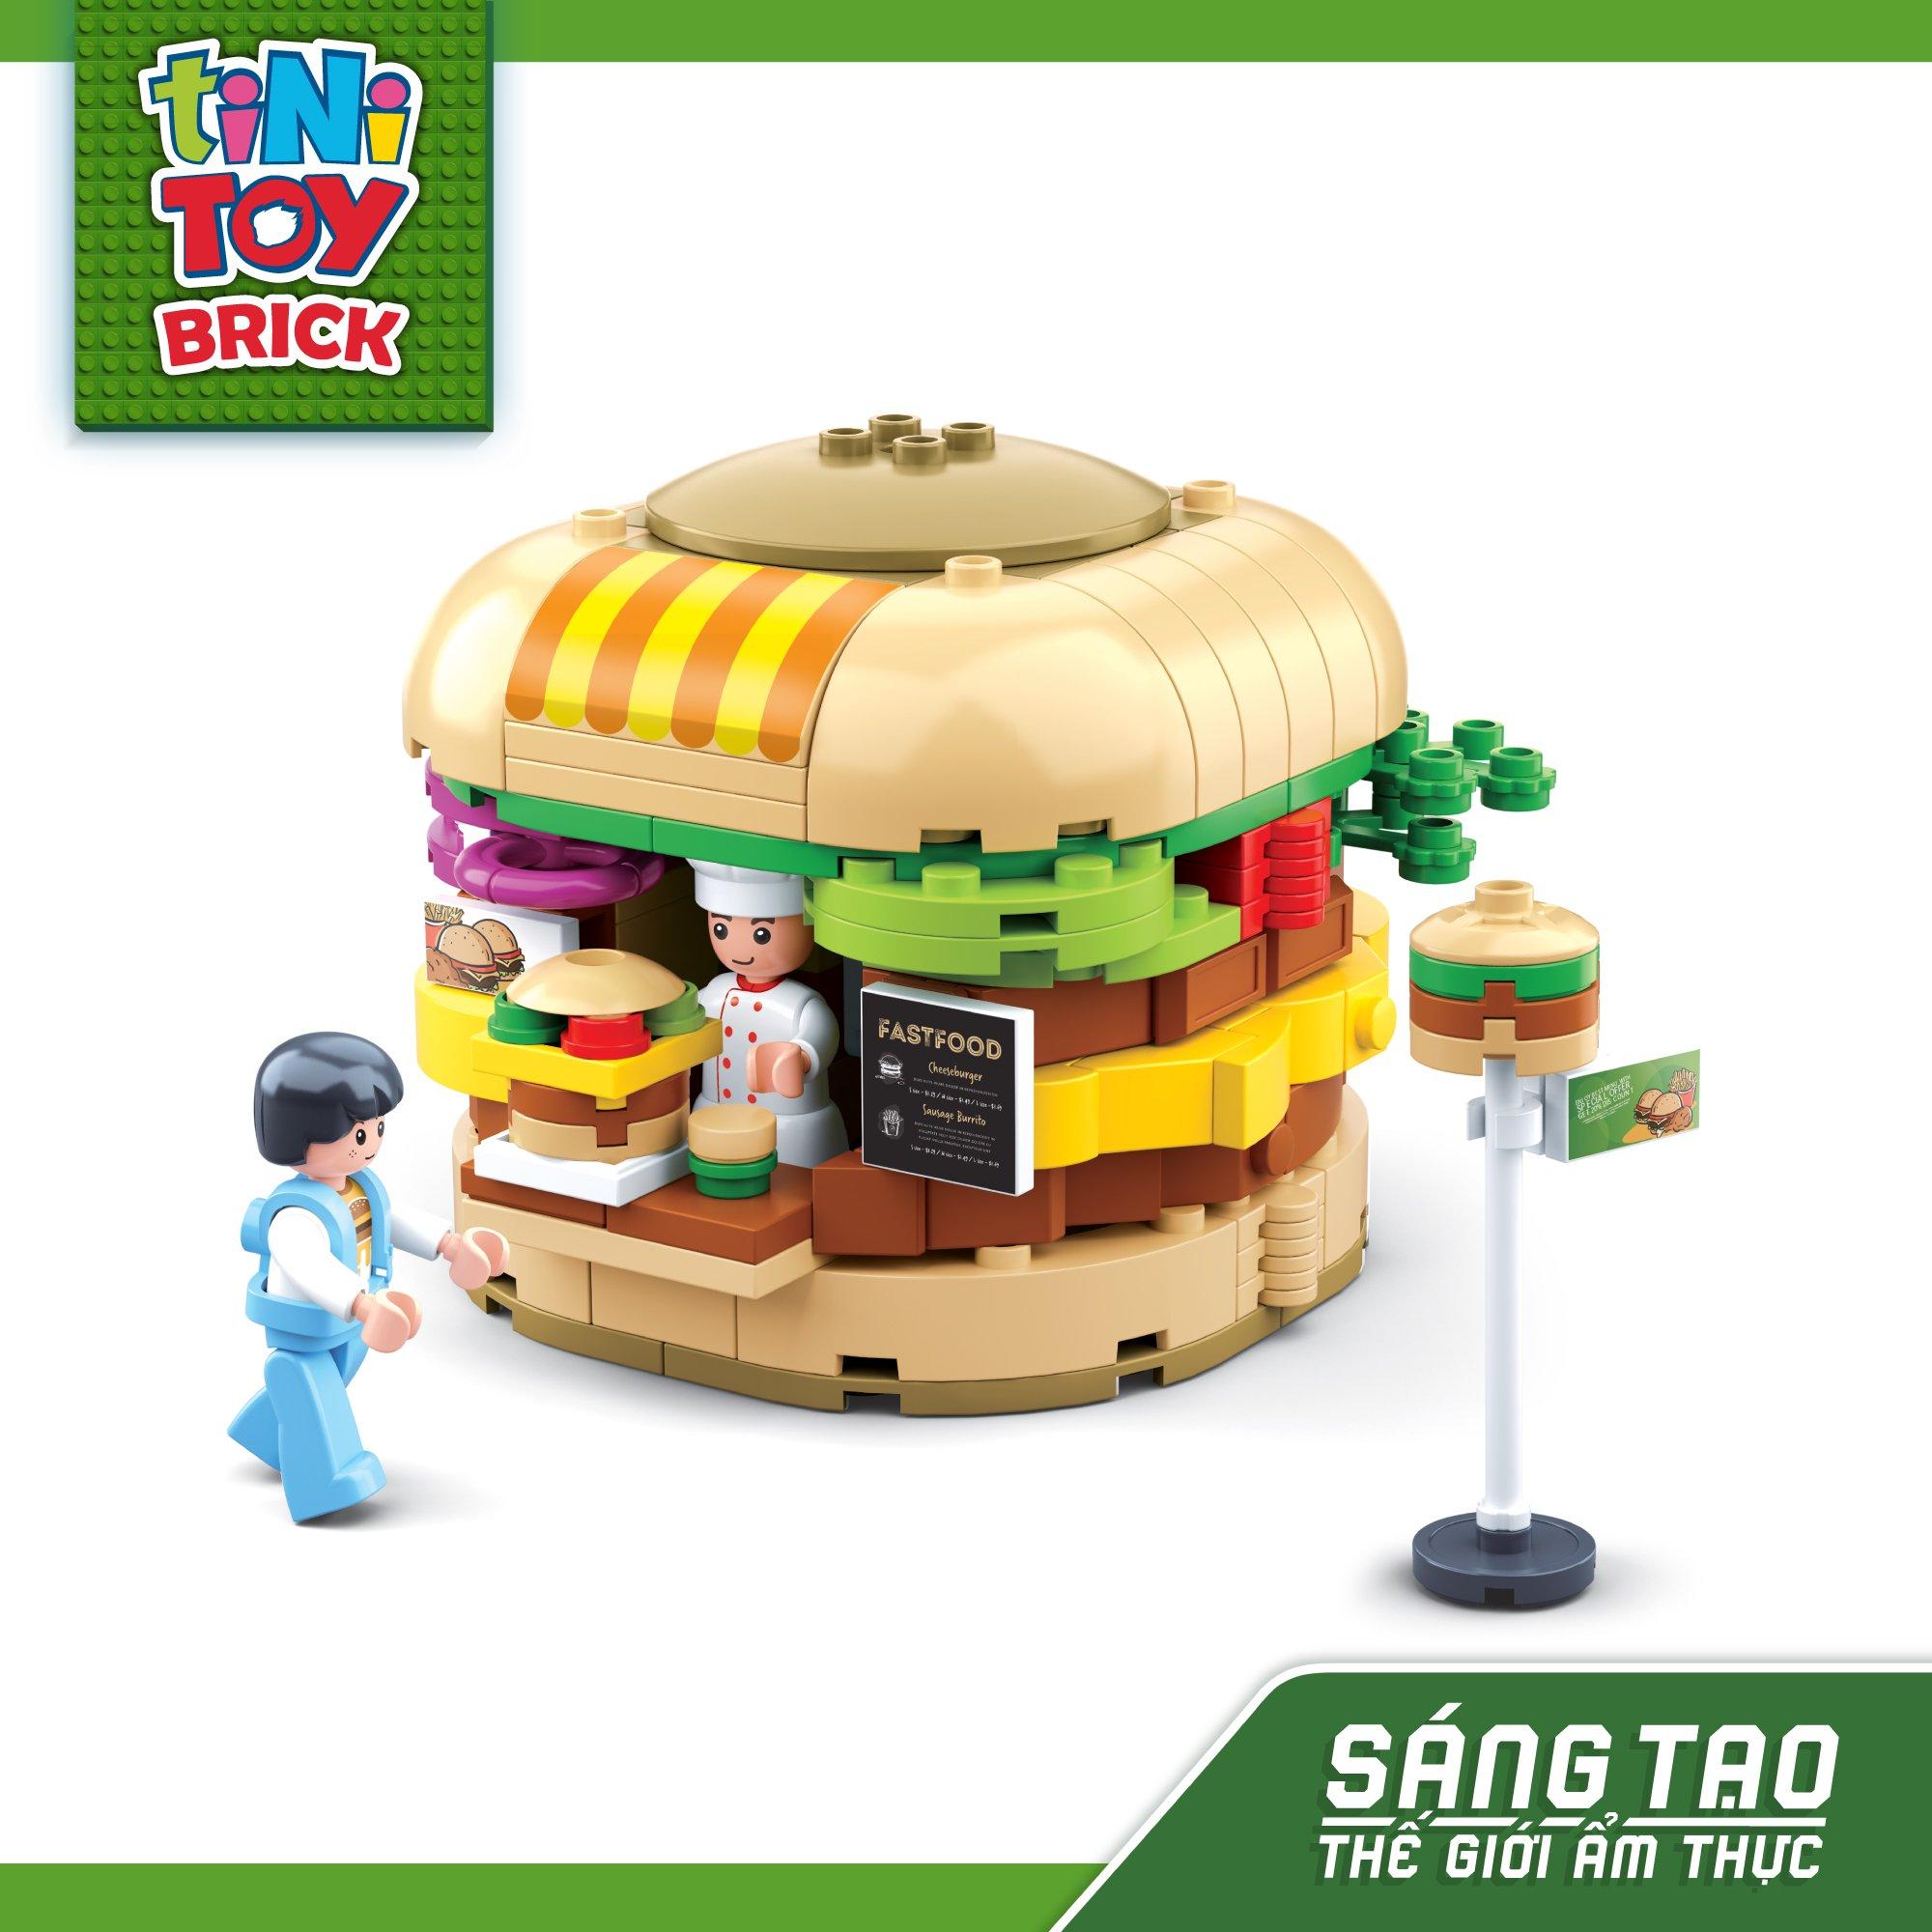 Đồ chơi lắp ráp quầy Hamburger TINITOY BRICK (276 pcs)